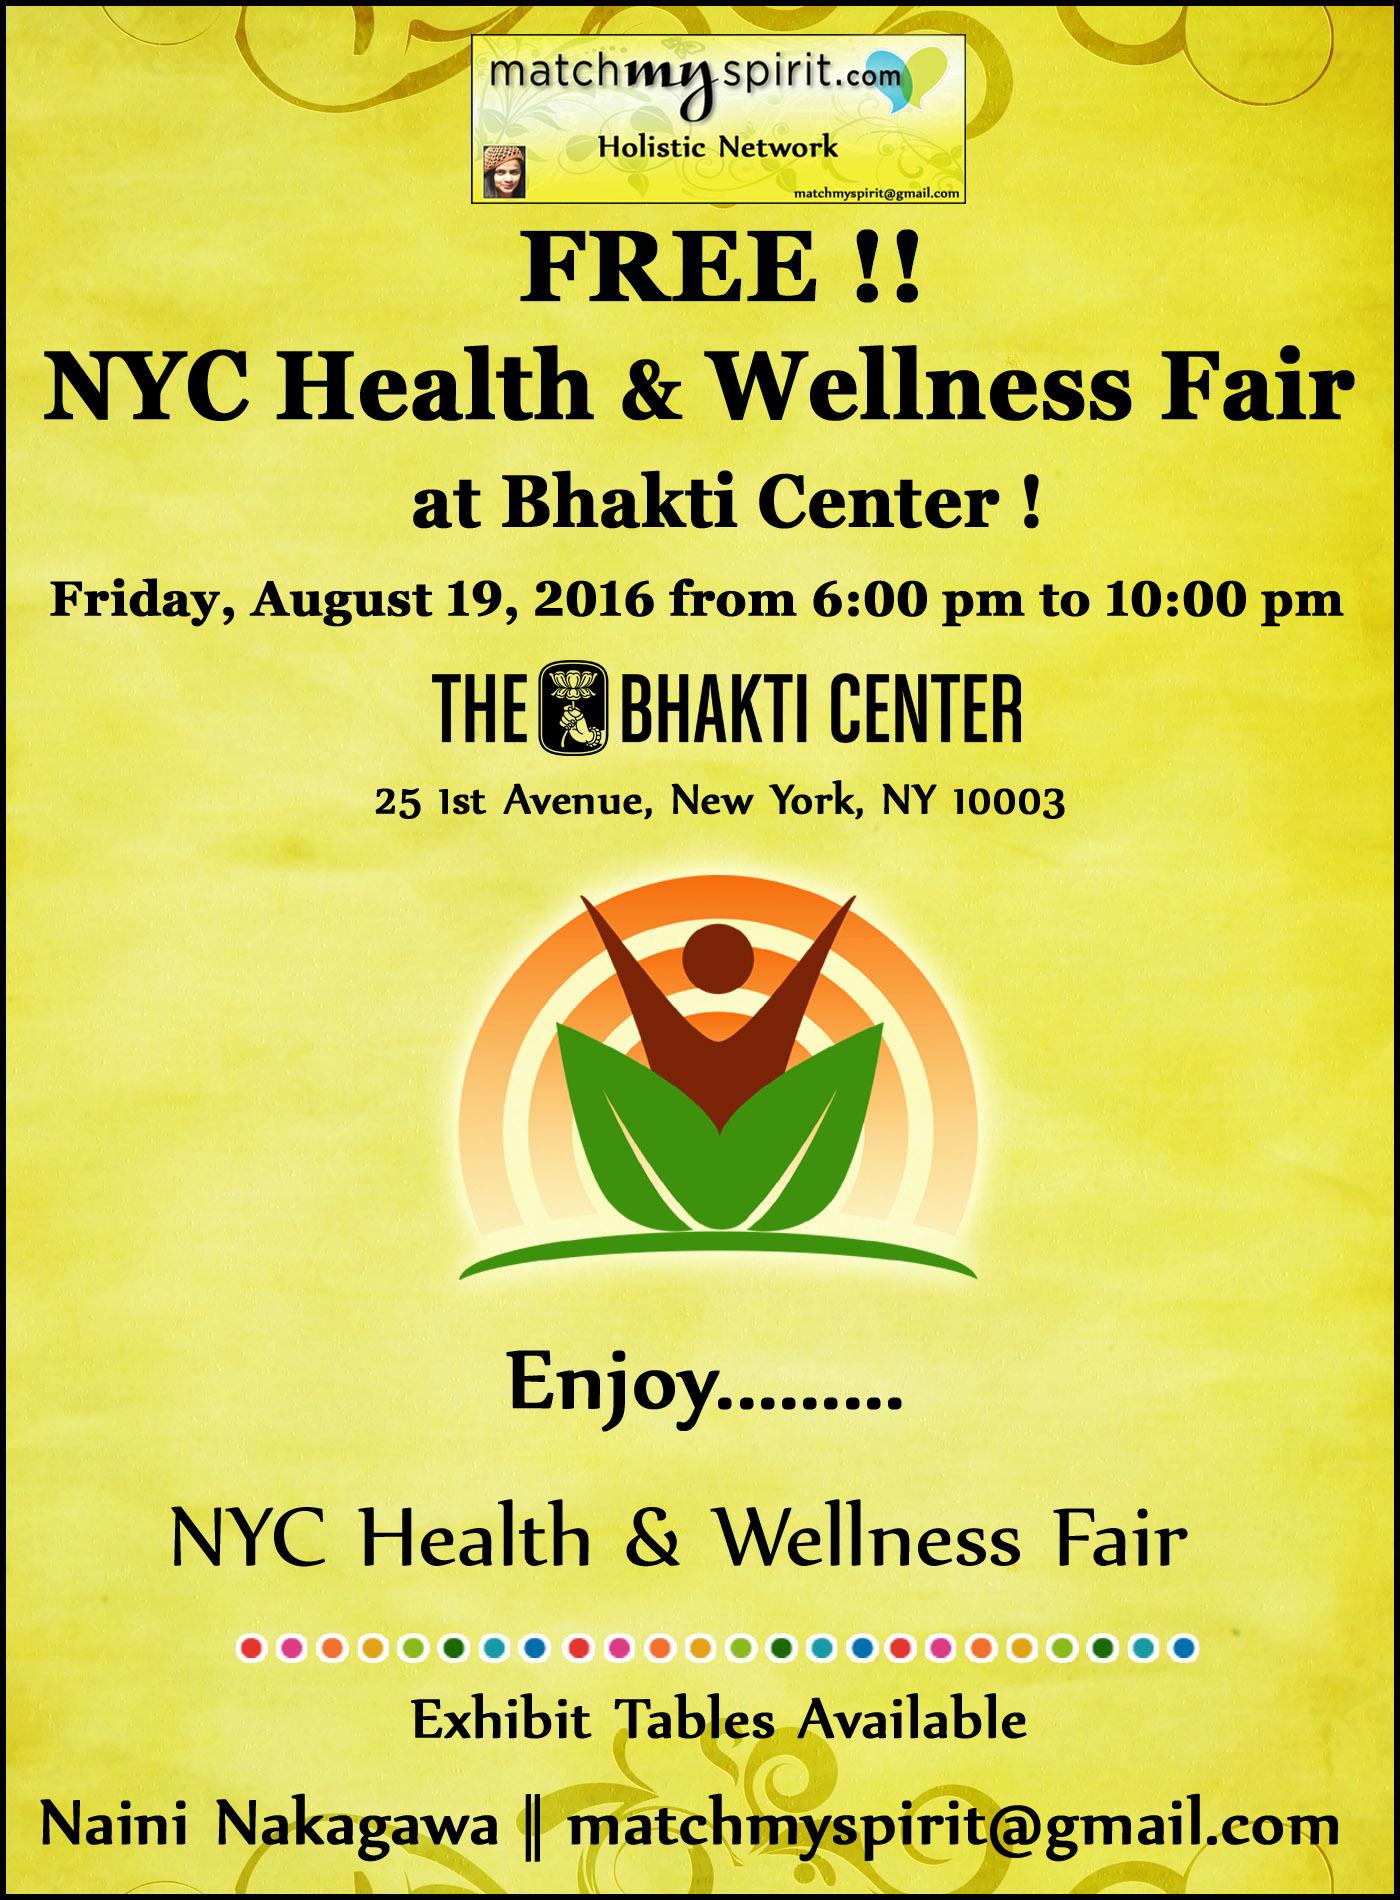 FREE!! NYC Health & Wellness Fair at Bhakti Center !